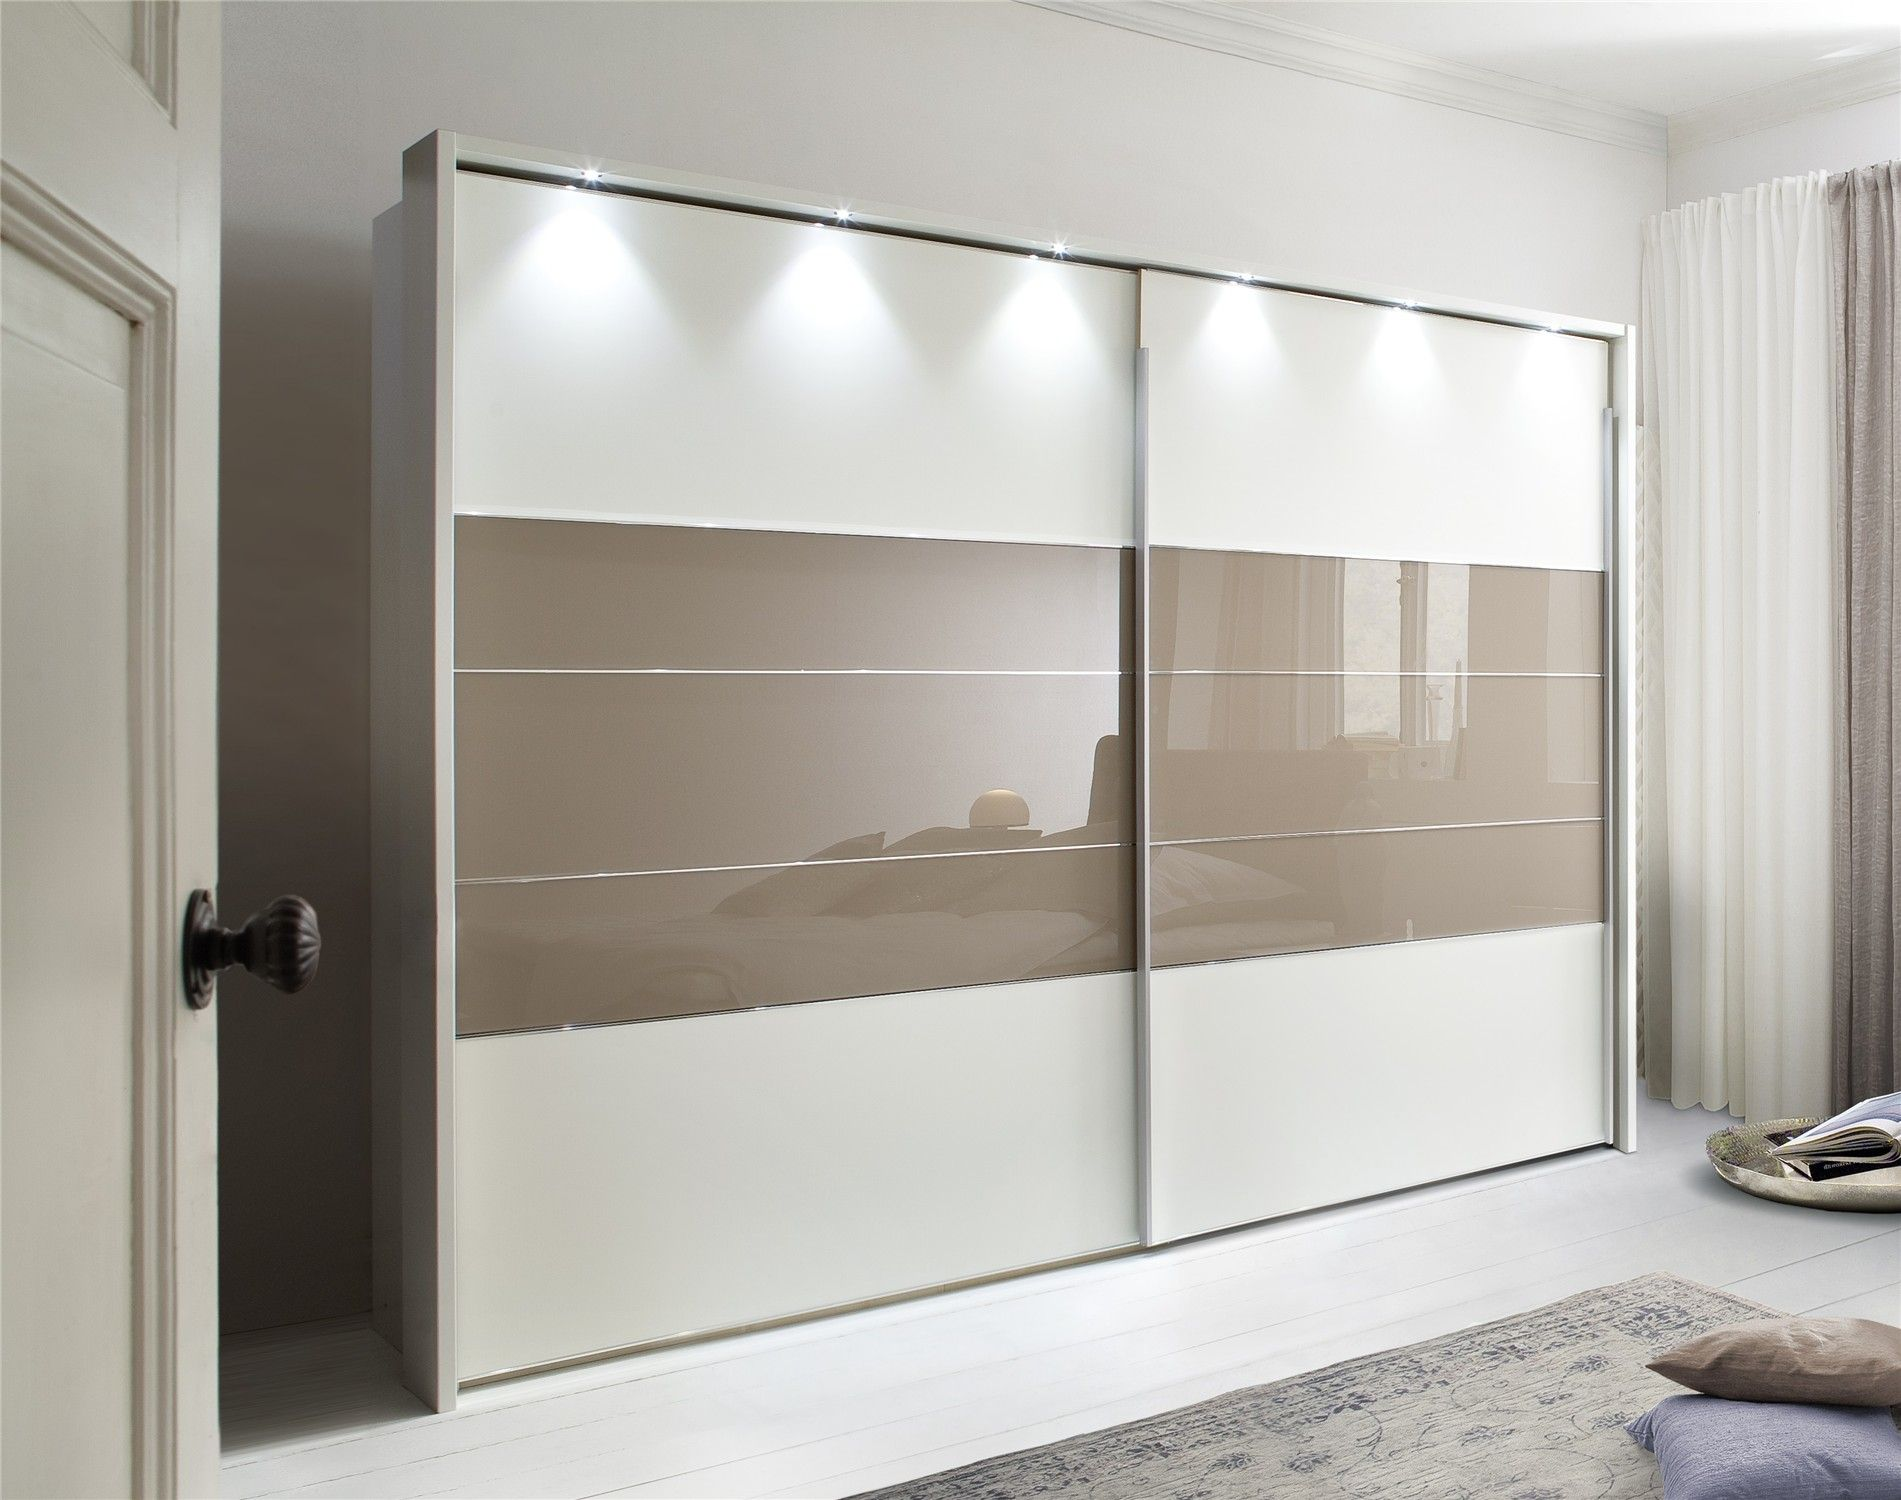 Wardrobe Mirror Sliding Doors Photo Album